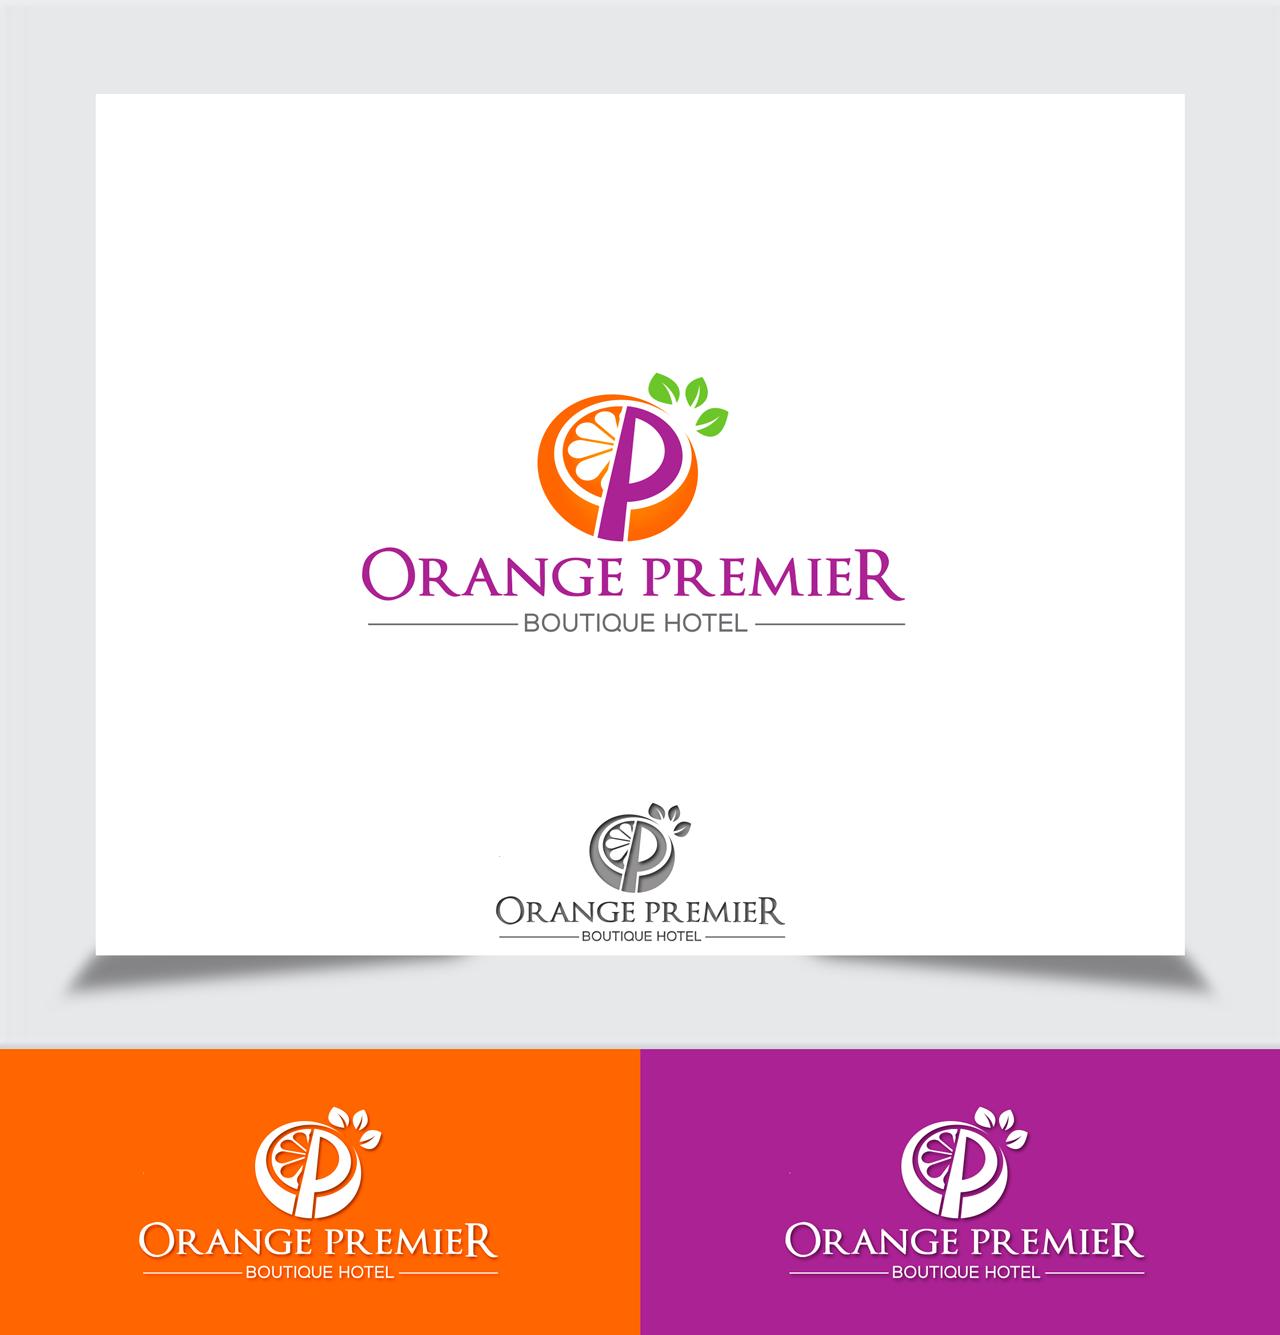 Logo Design by Tajammul Hussain - Entry No. 102 in the Logo Design Contest Captivating Logo Design for Orange Premier.